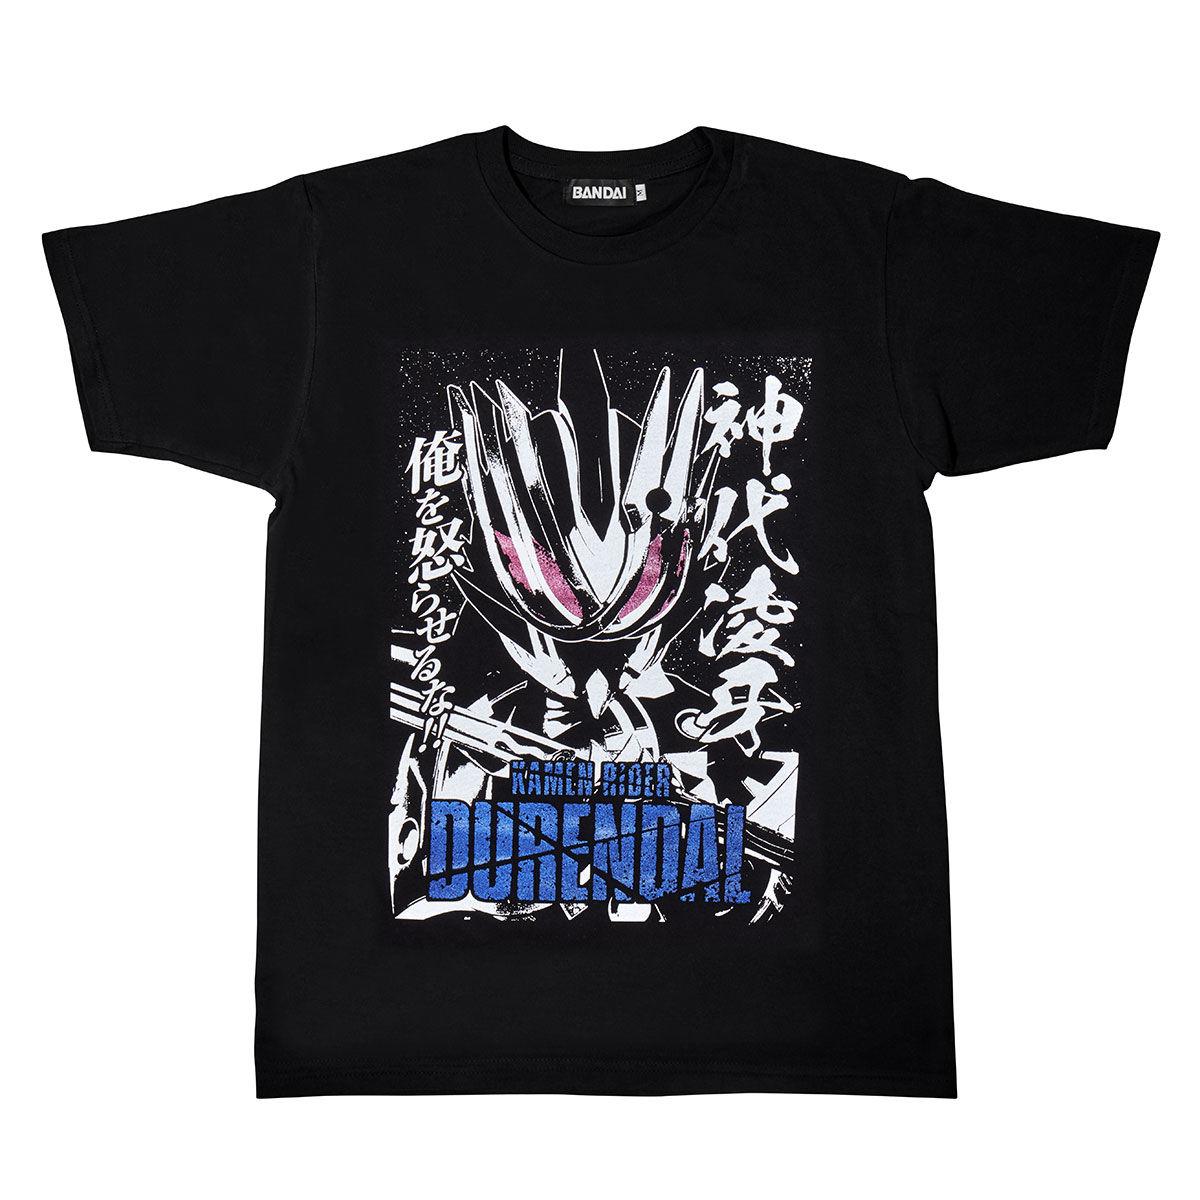 Kamen Rider Saber Ryoga Shindai T-shirt [Dec 2021 Delivery]